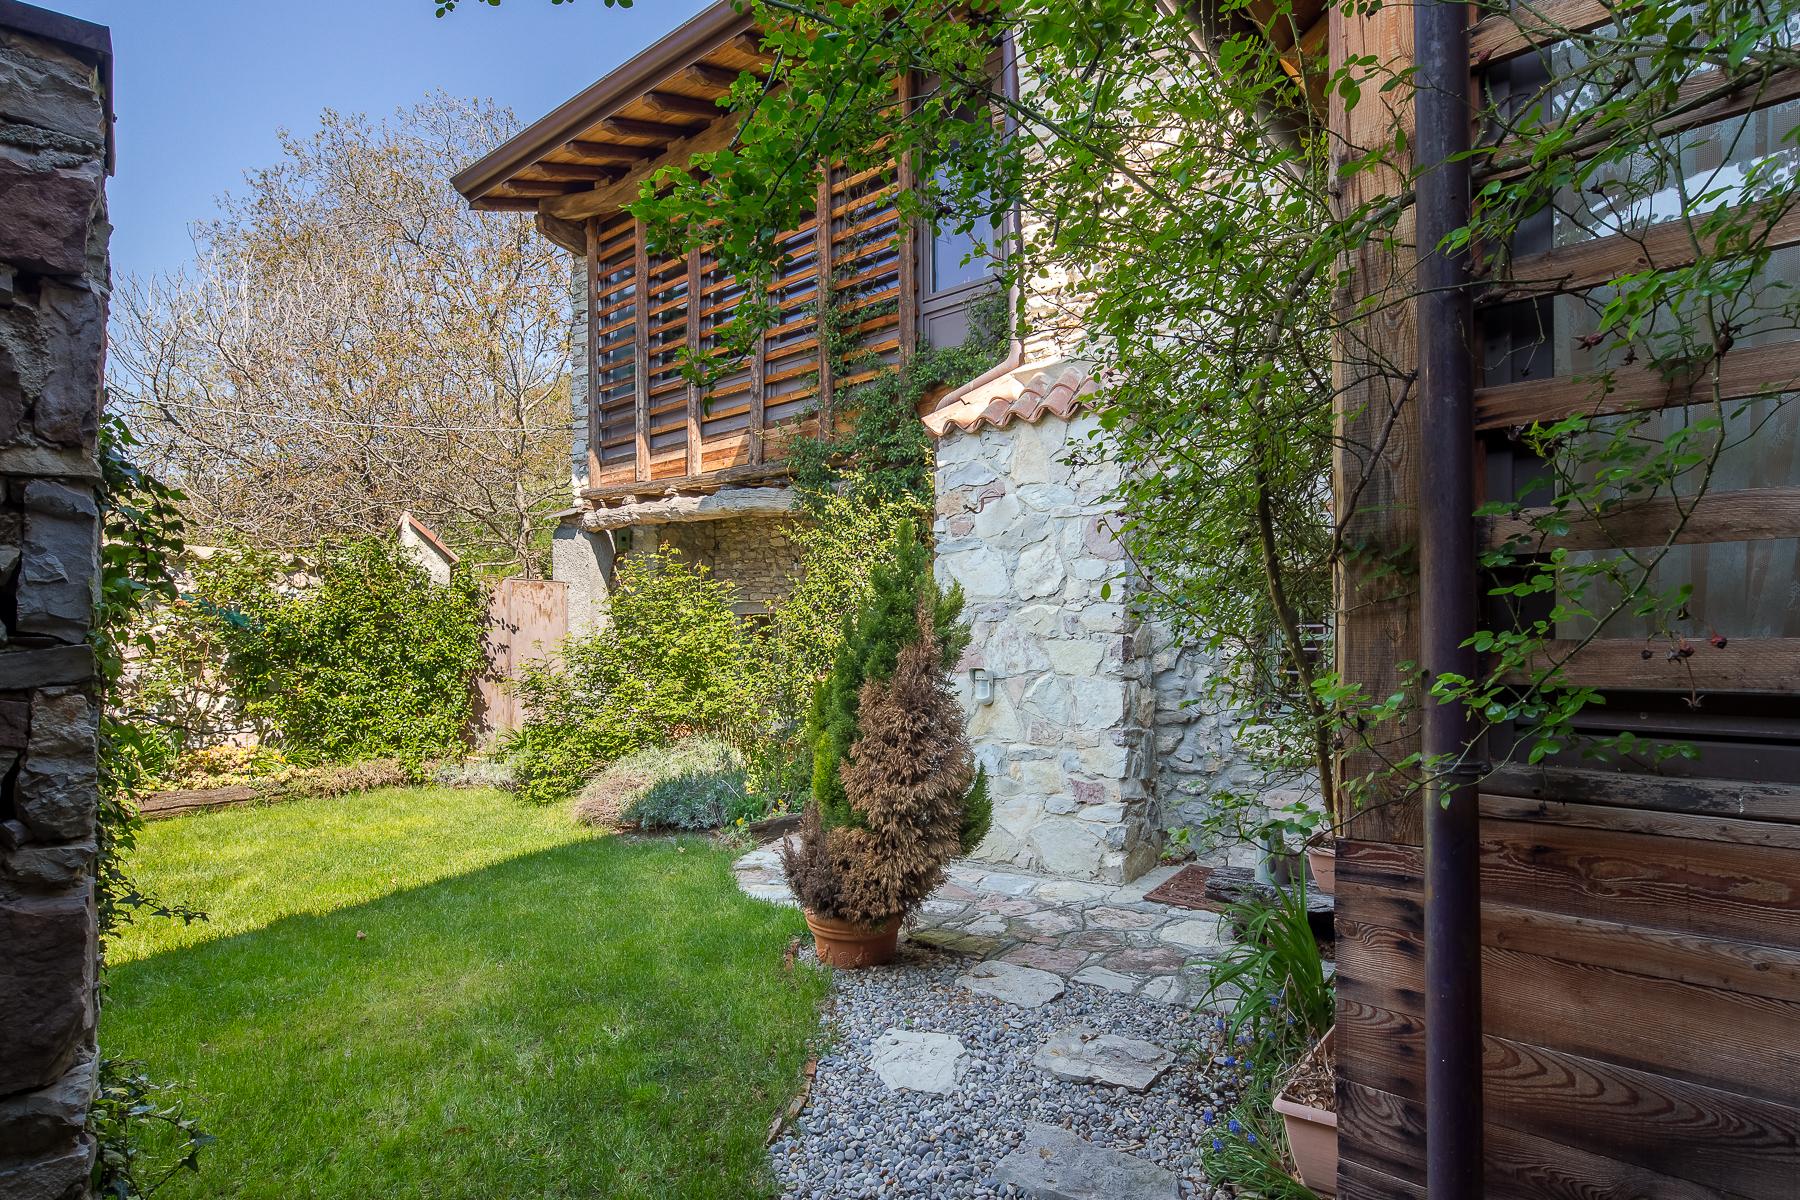 Casa indipendente in Vendita a Caprino Bergamasco: 5 locali, 500 mq - Foto 11